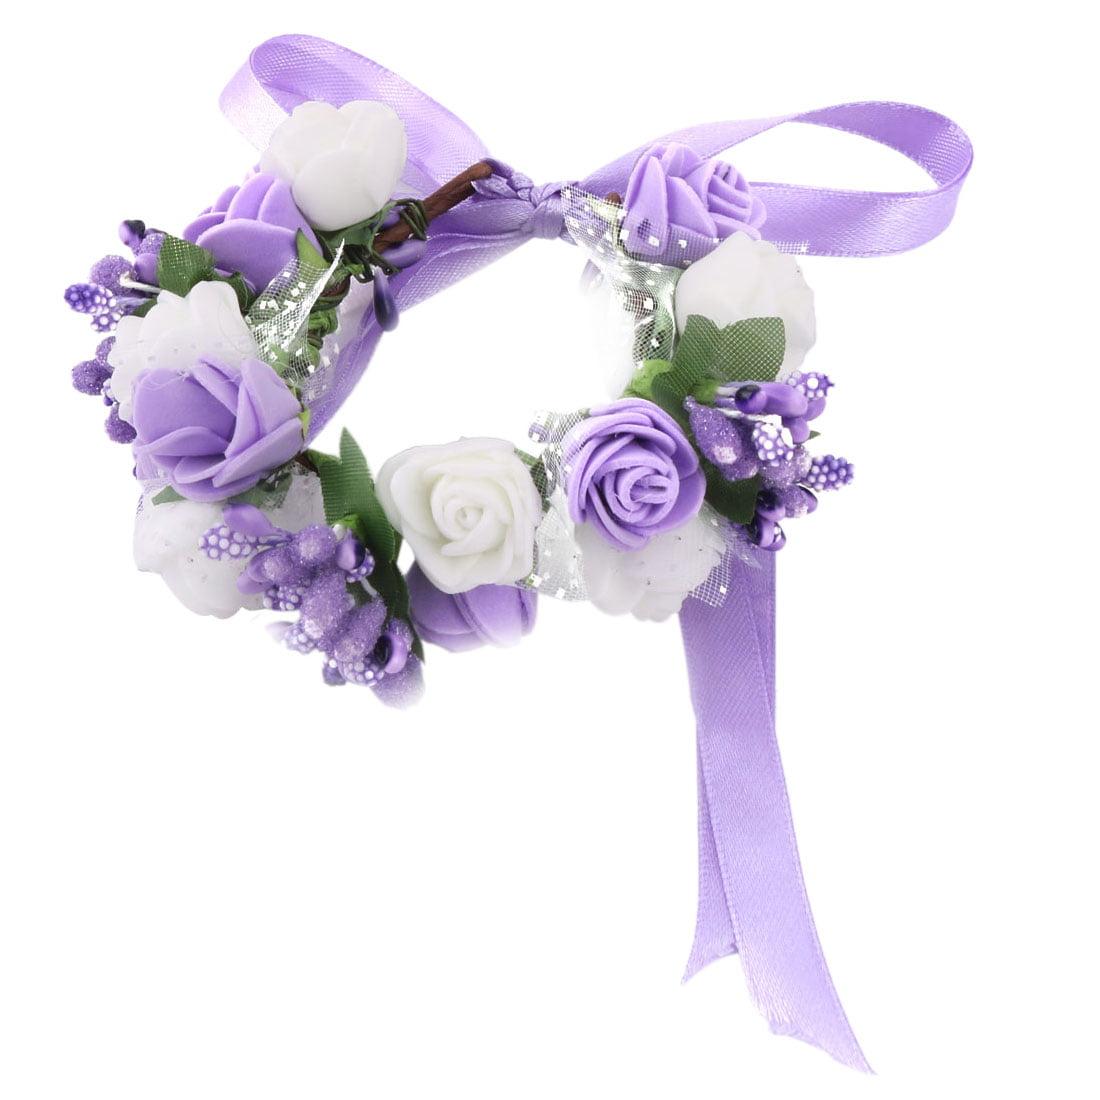 Bride Wedding Foam Double Layer Artificial Wrist Flower DIY Decor Purple White